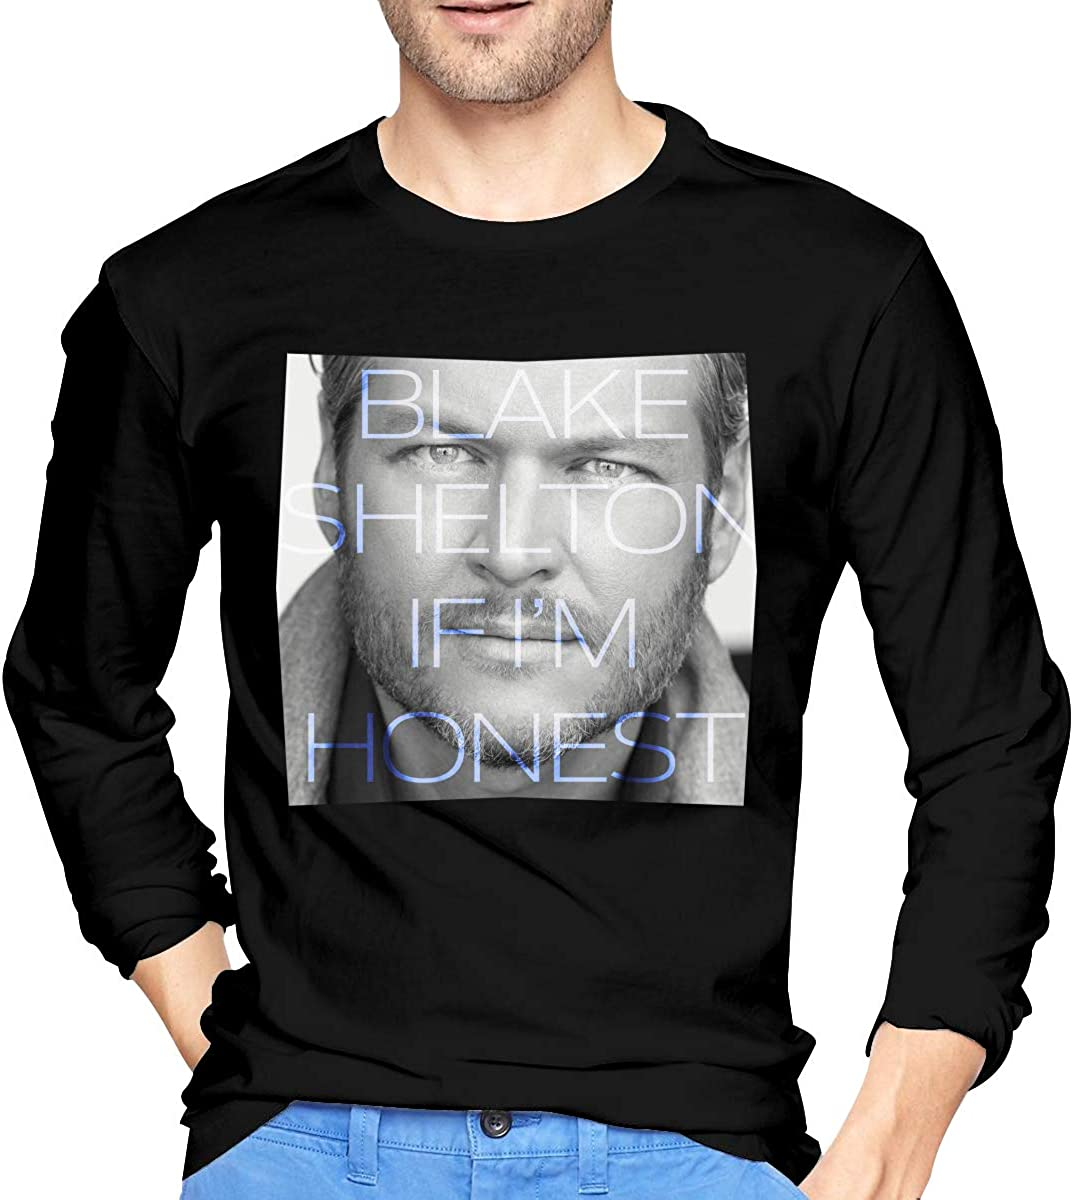 Blake Shelton If I'm Honest Fashion Round Neck T-shirt Casual Shirt Top Black